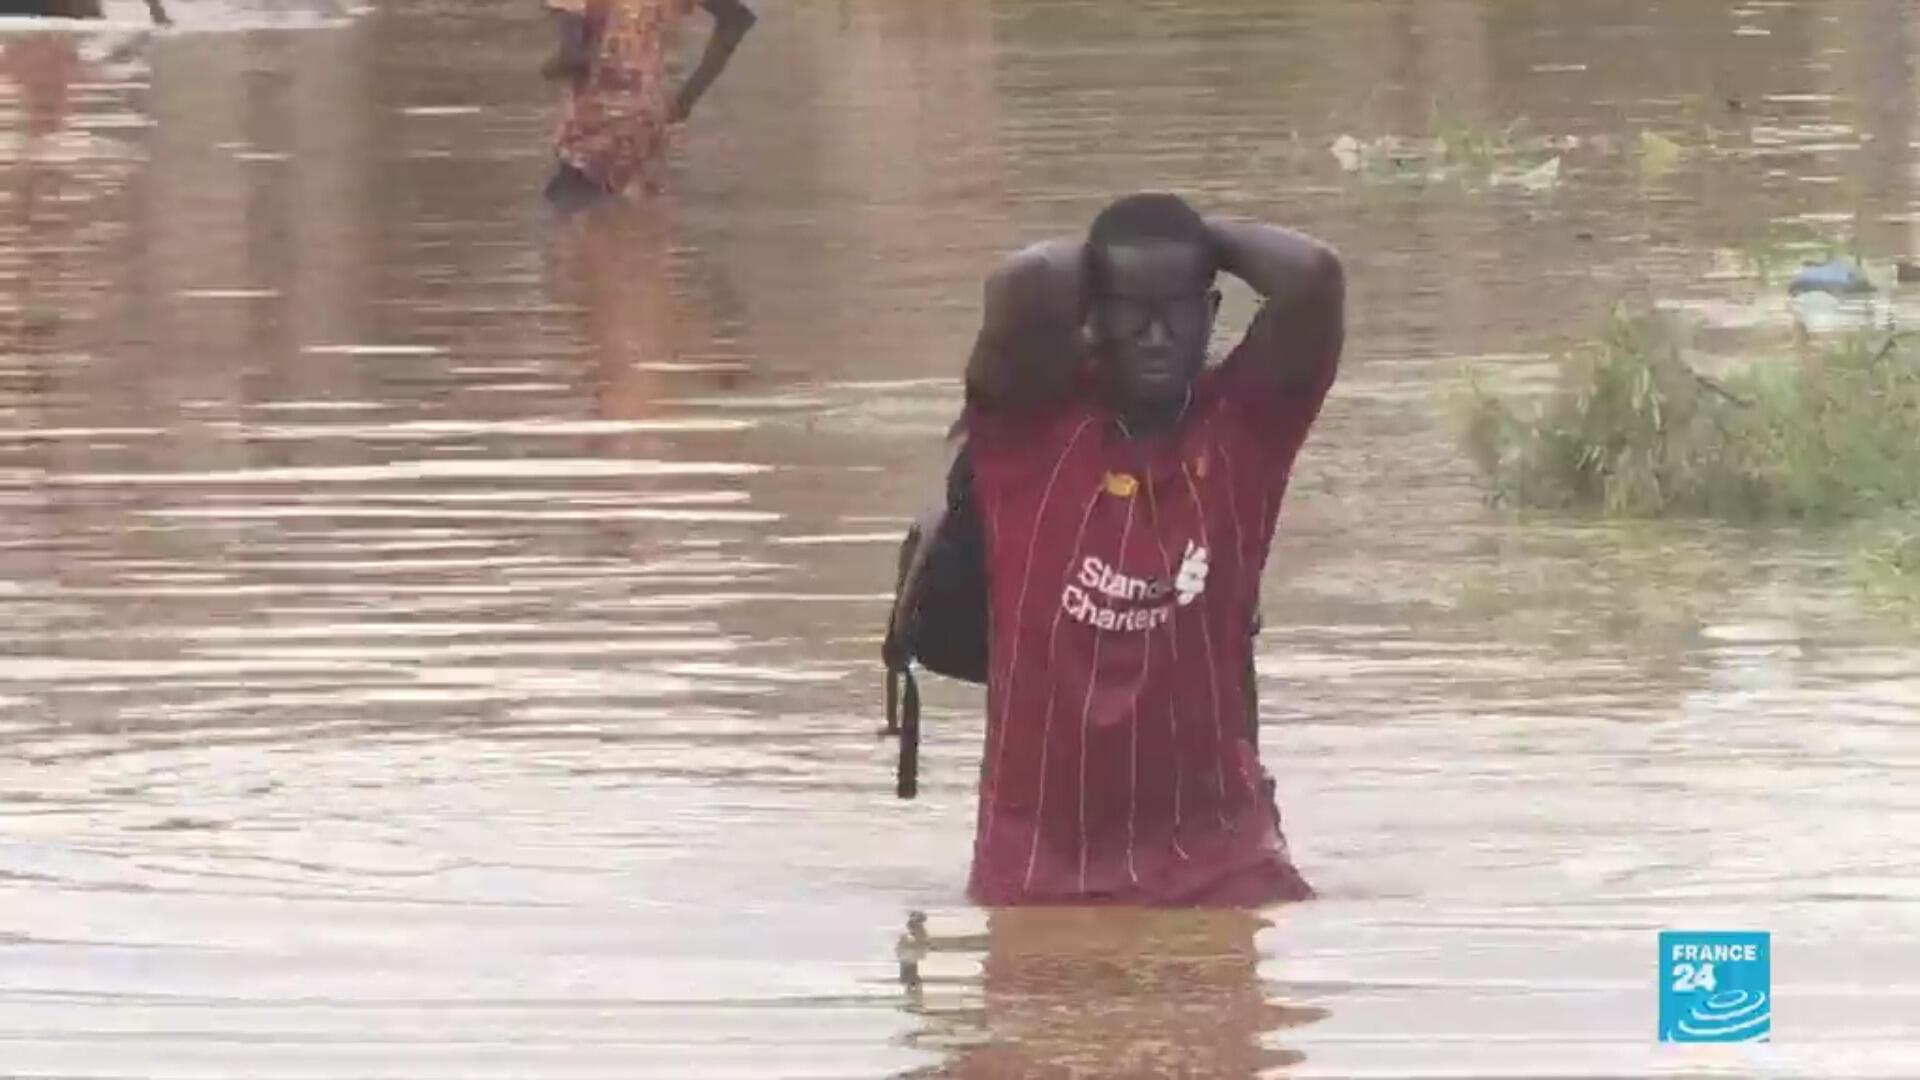 A man wades through floodwaters in Keur Massar, a suburb of Dakar, Senegal.